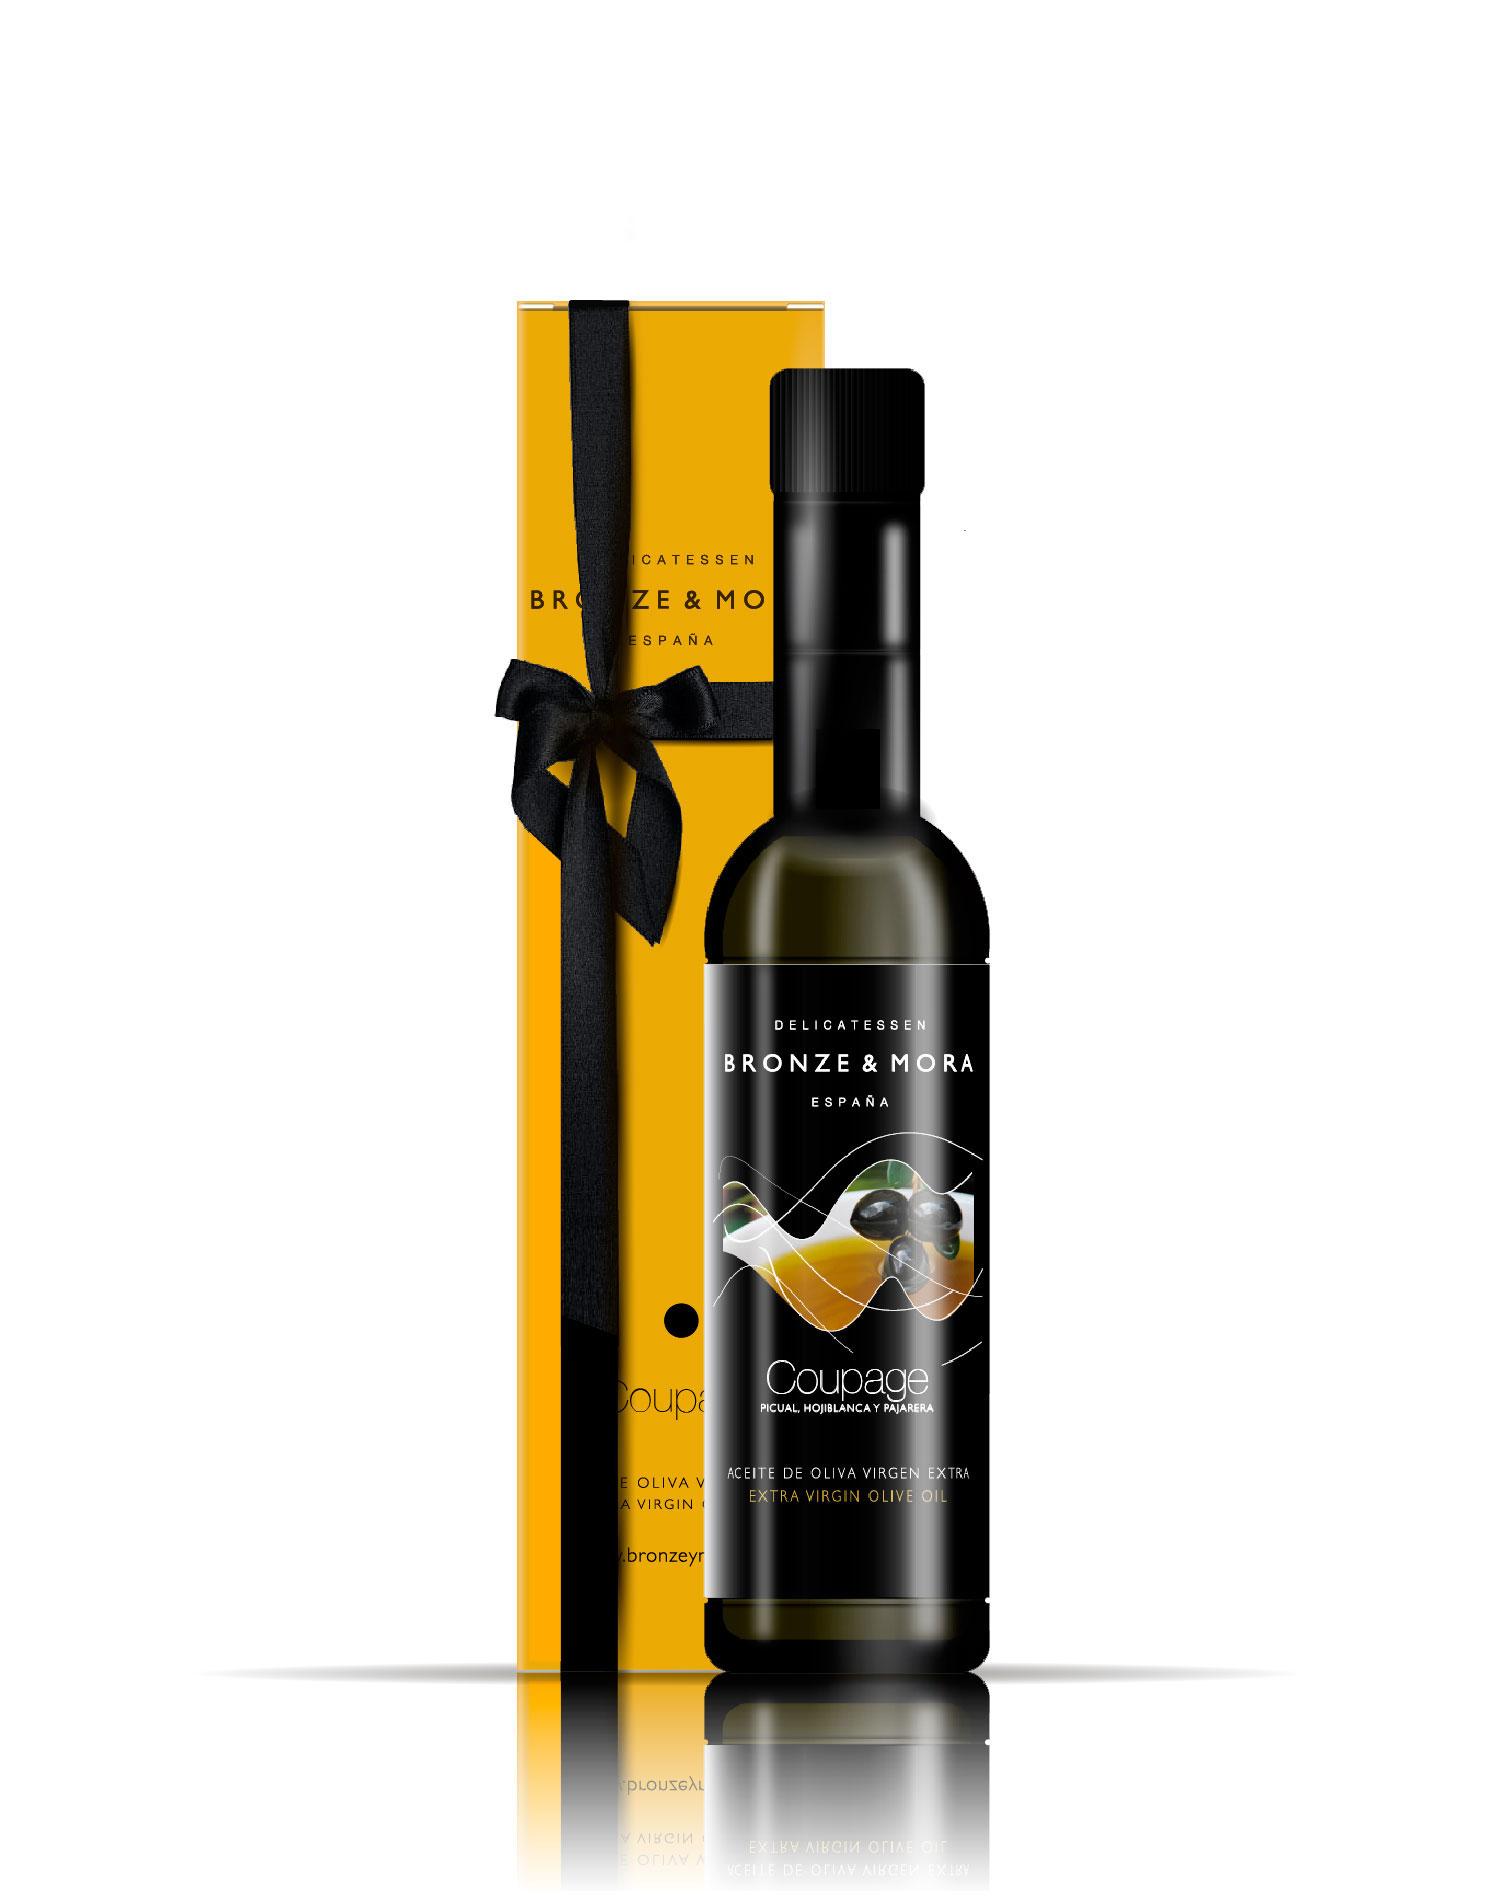 Botella aceite de oliva Coupage Bronze & Mora regalo gourmet